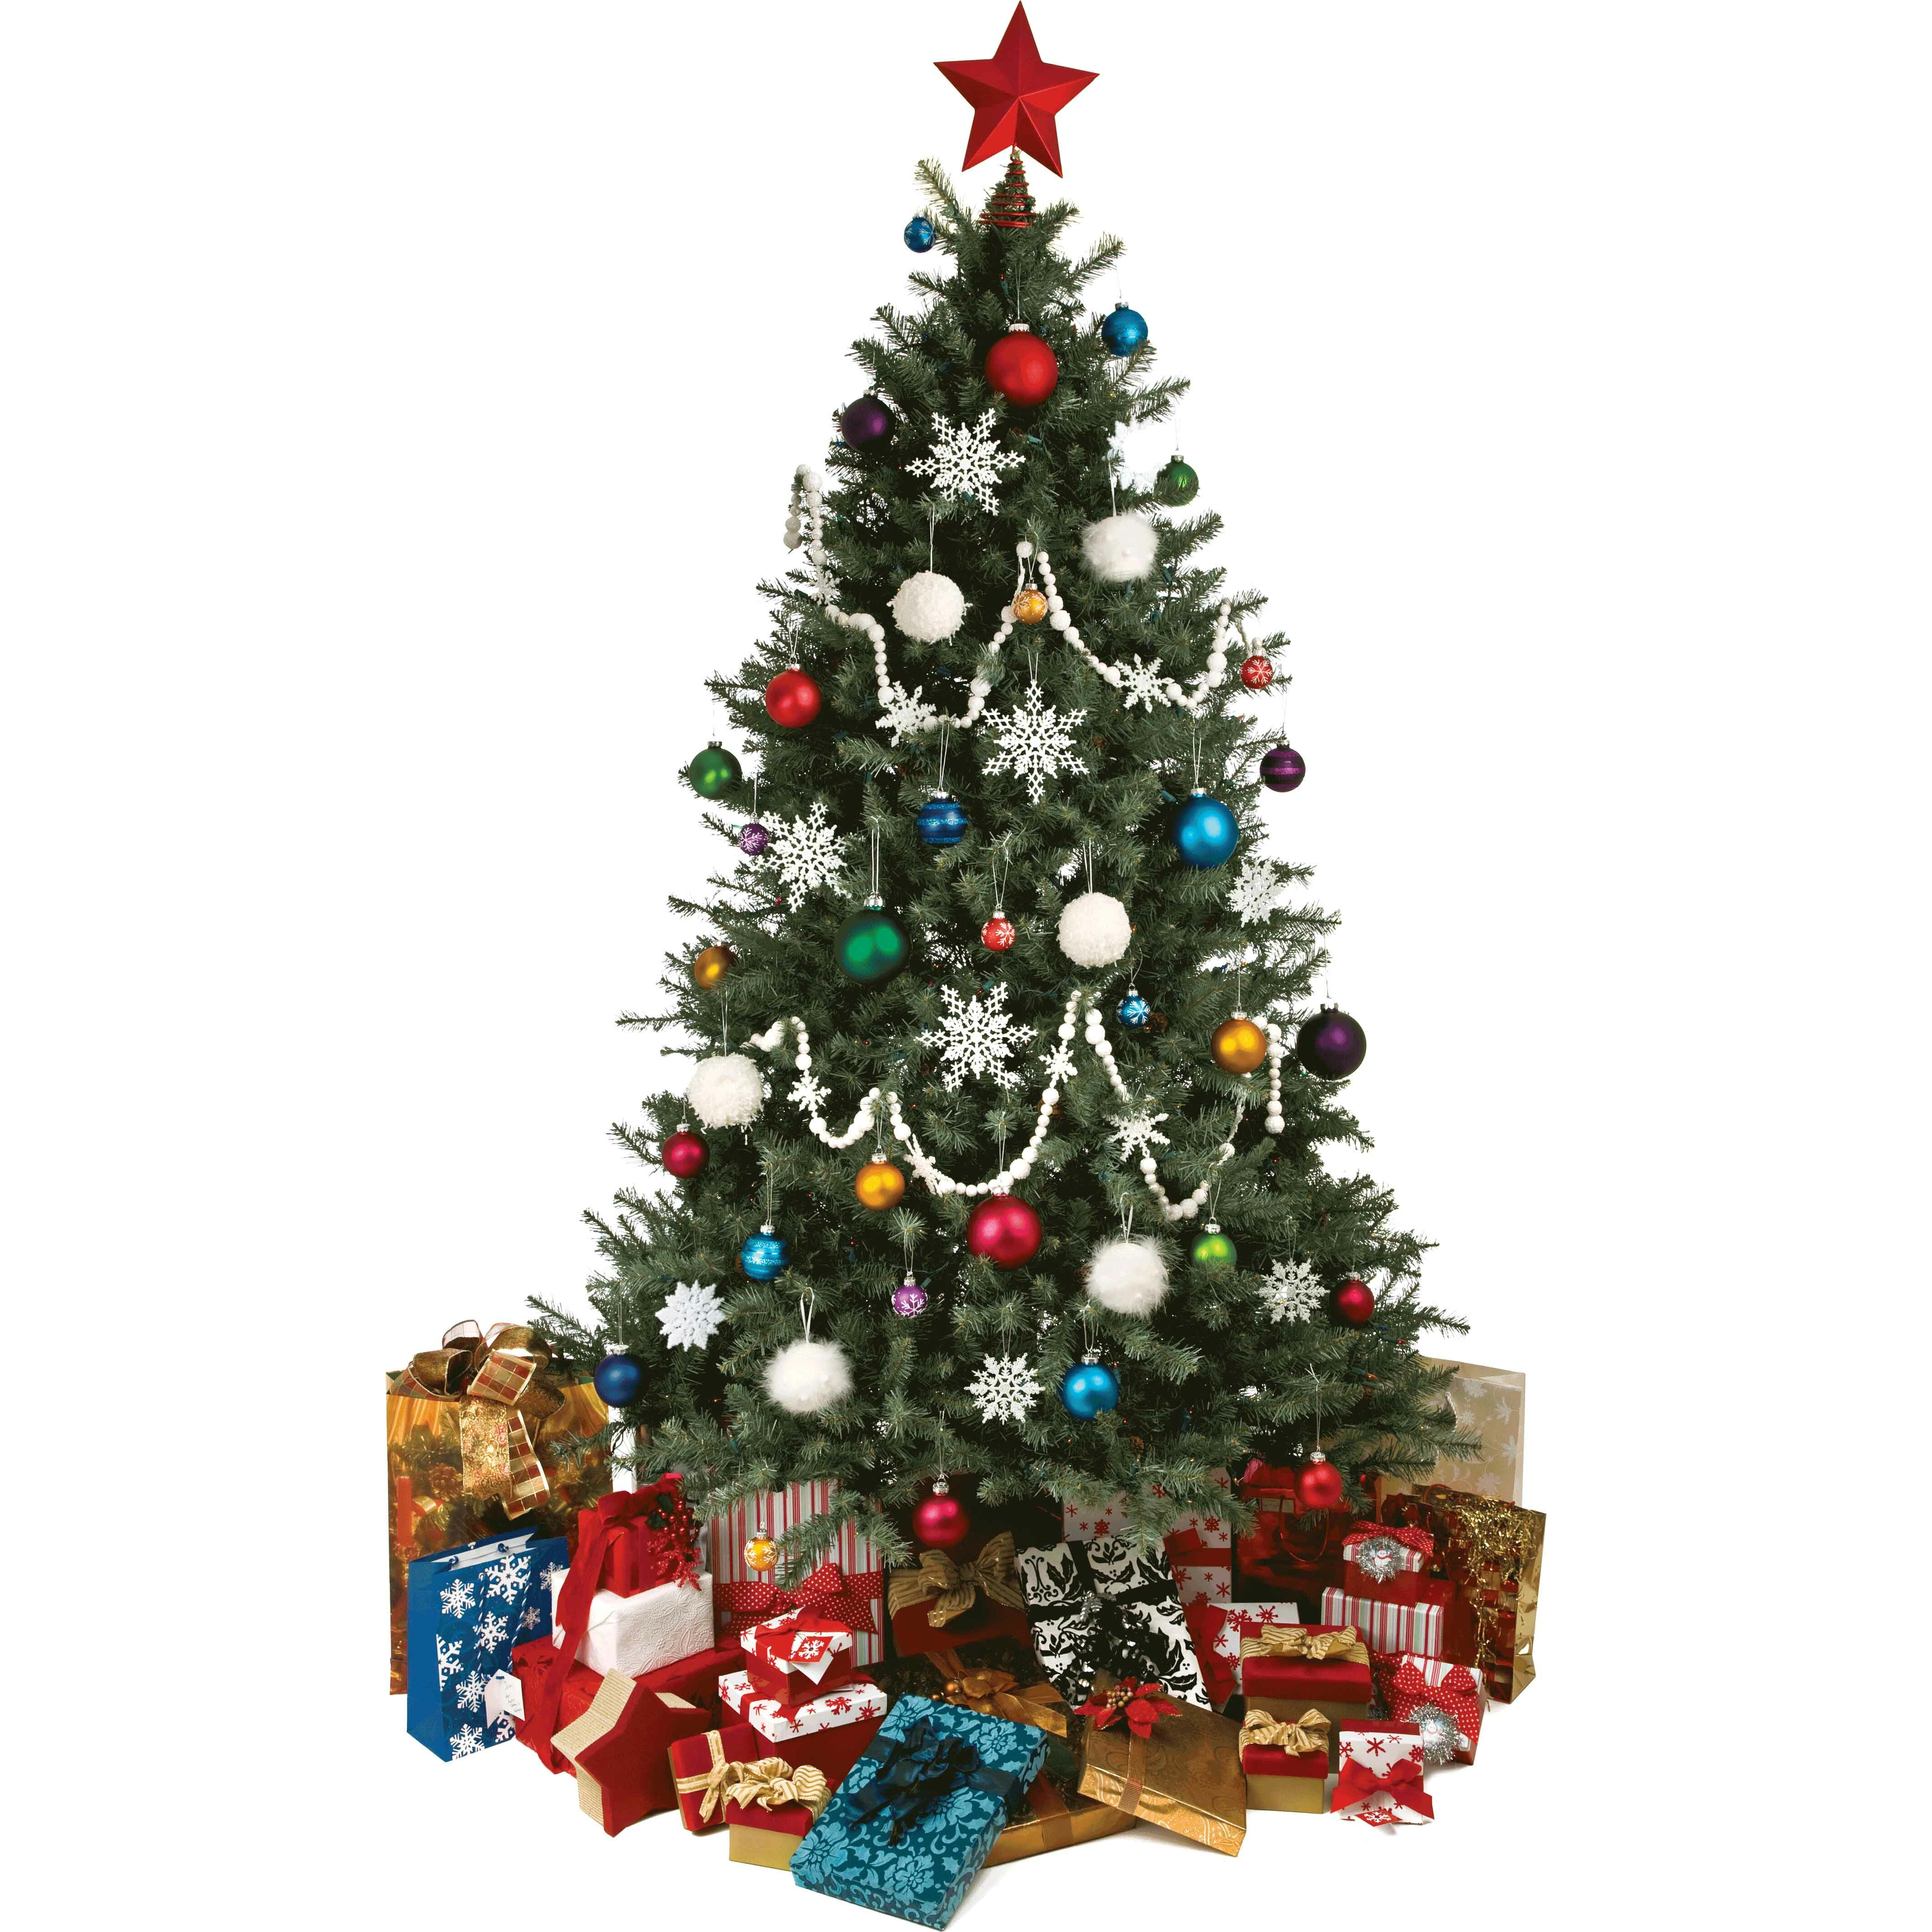 Christmas Tree Cutout Wall Decal Wayfair